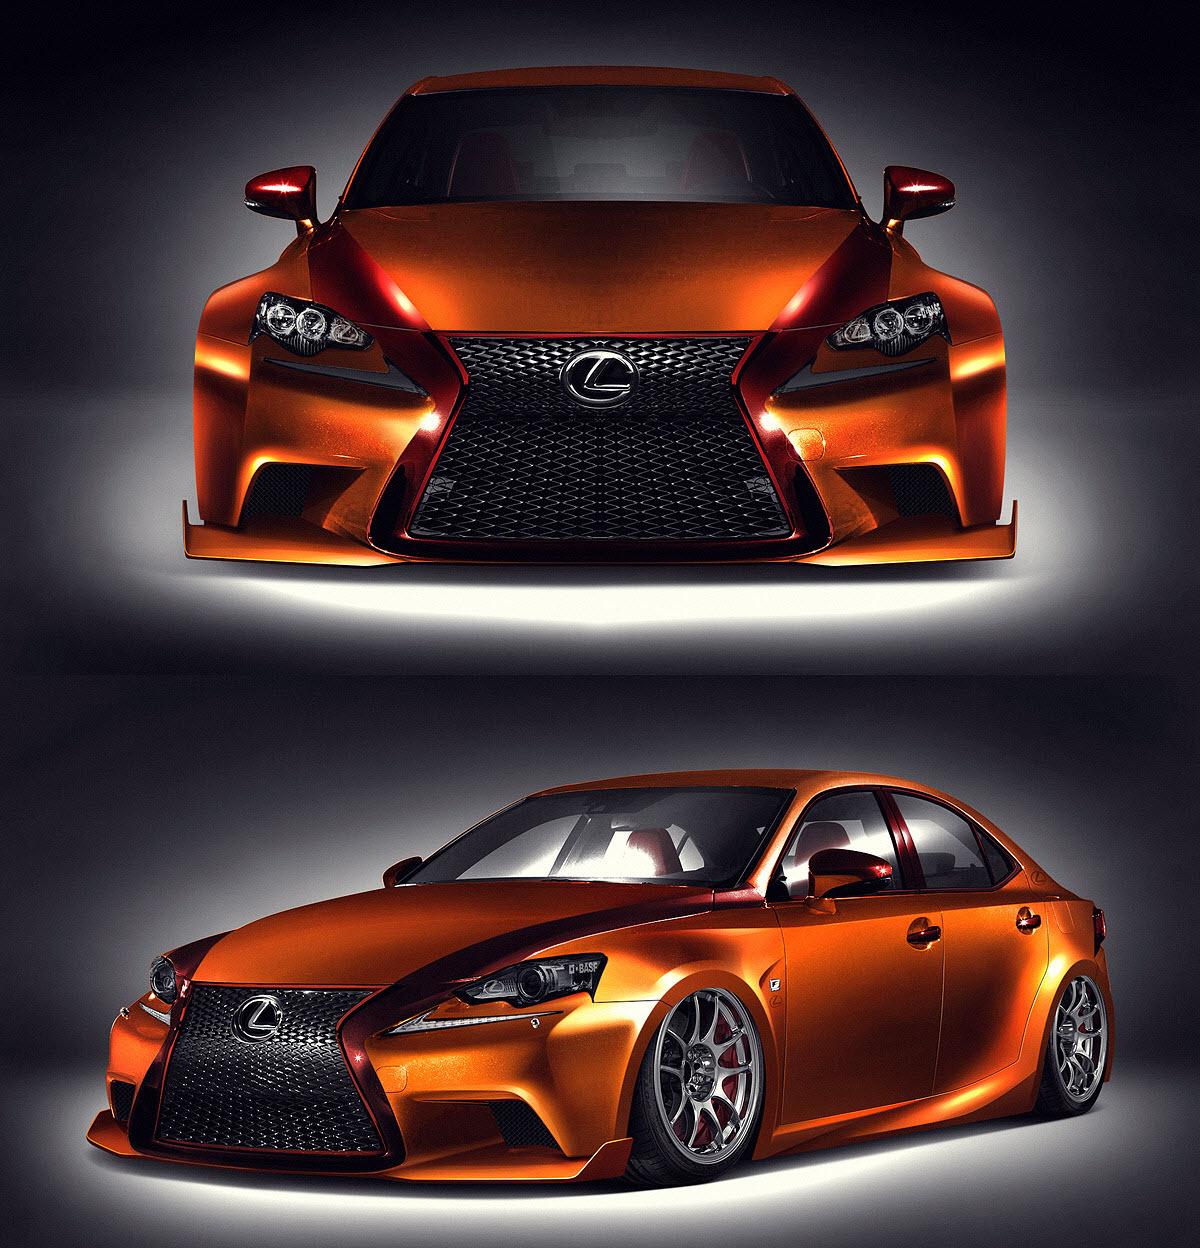 News Lexus Driving Design At Sema Apsley Cars